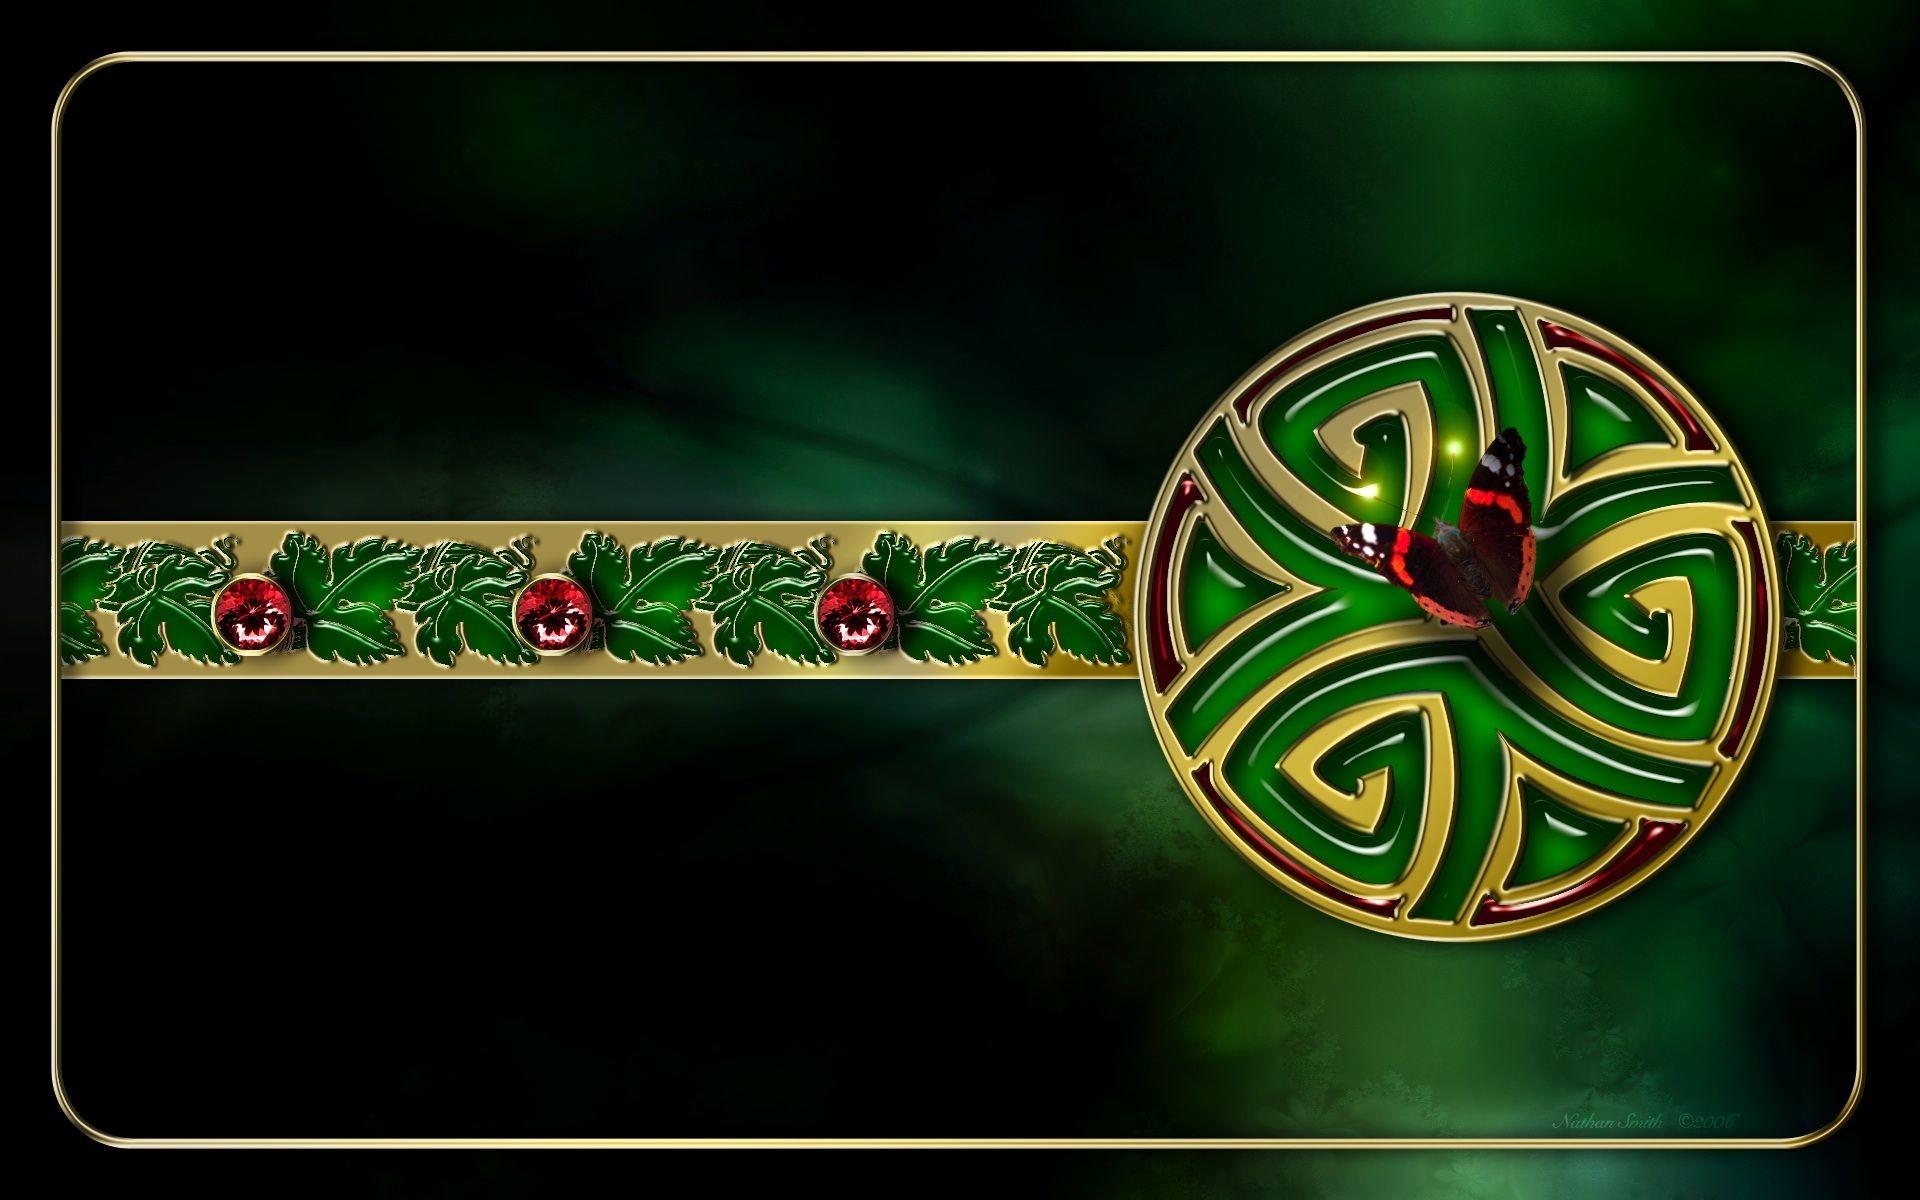 luck of the irish wallpaper – Google Search | St. Patricks Day .